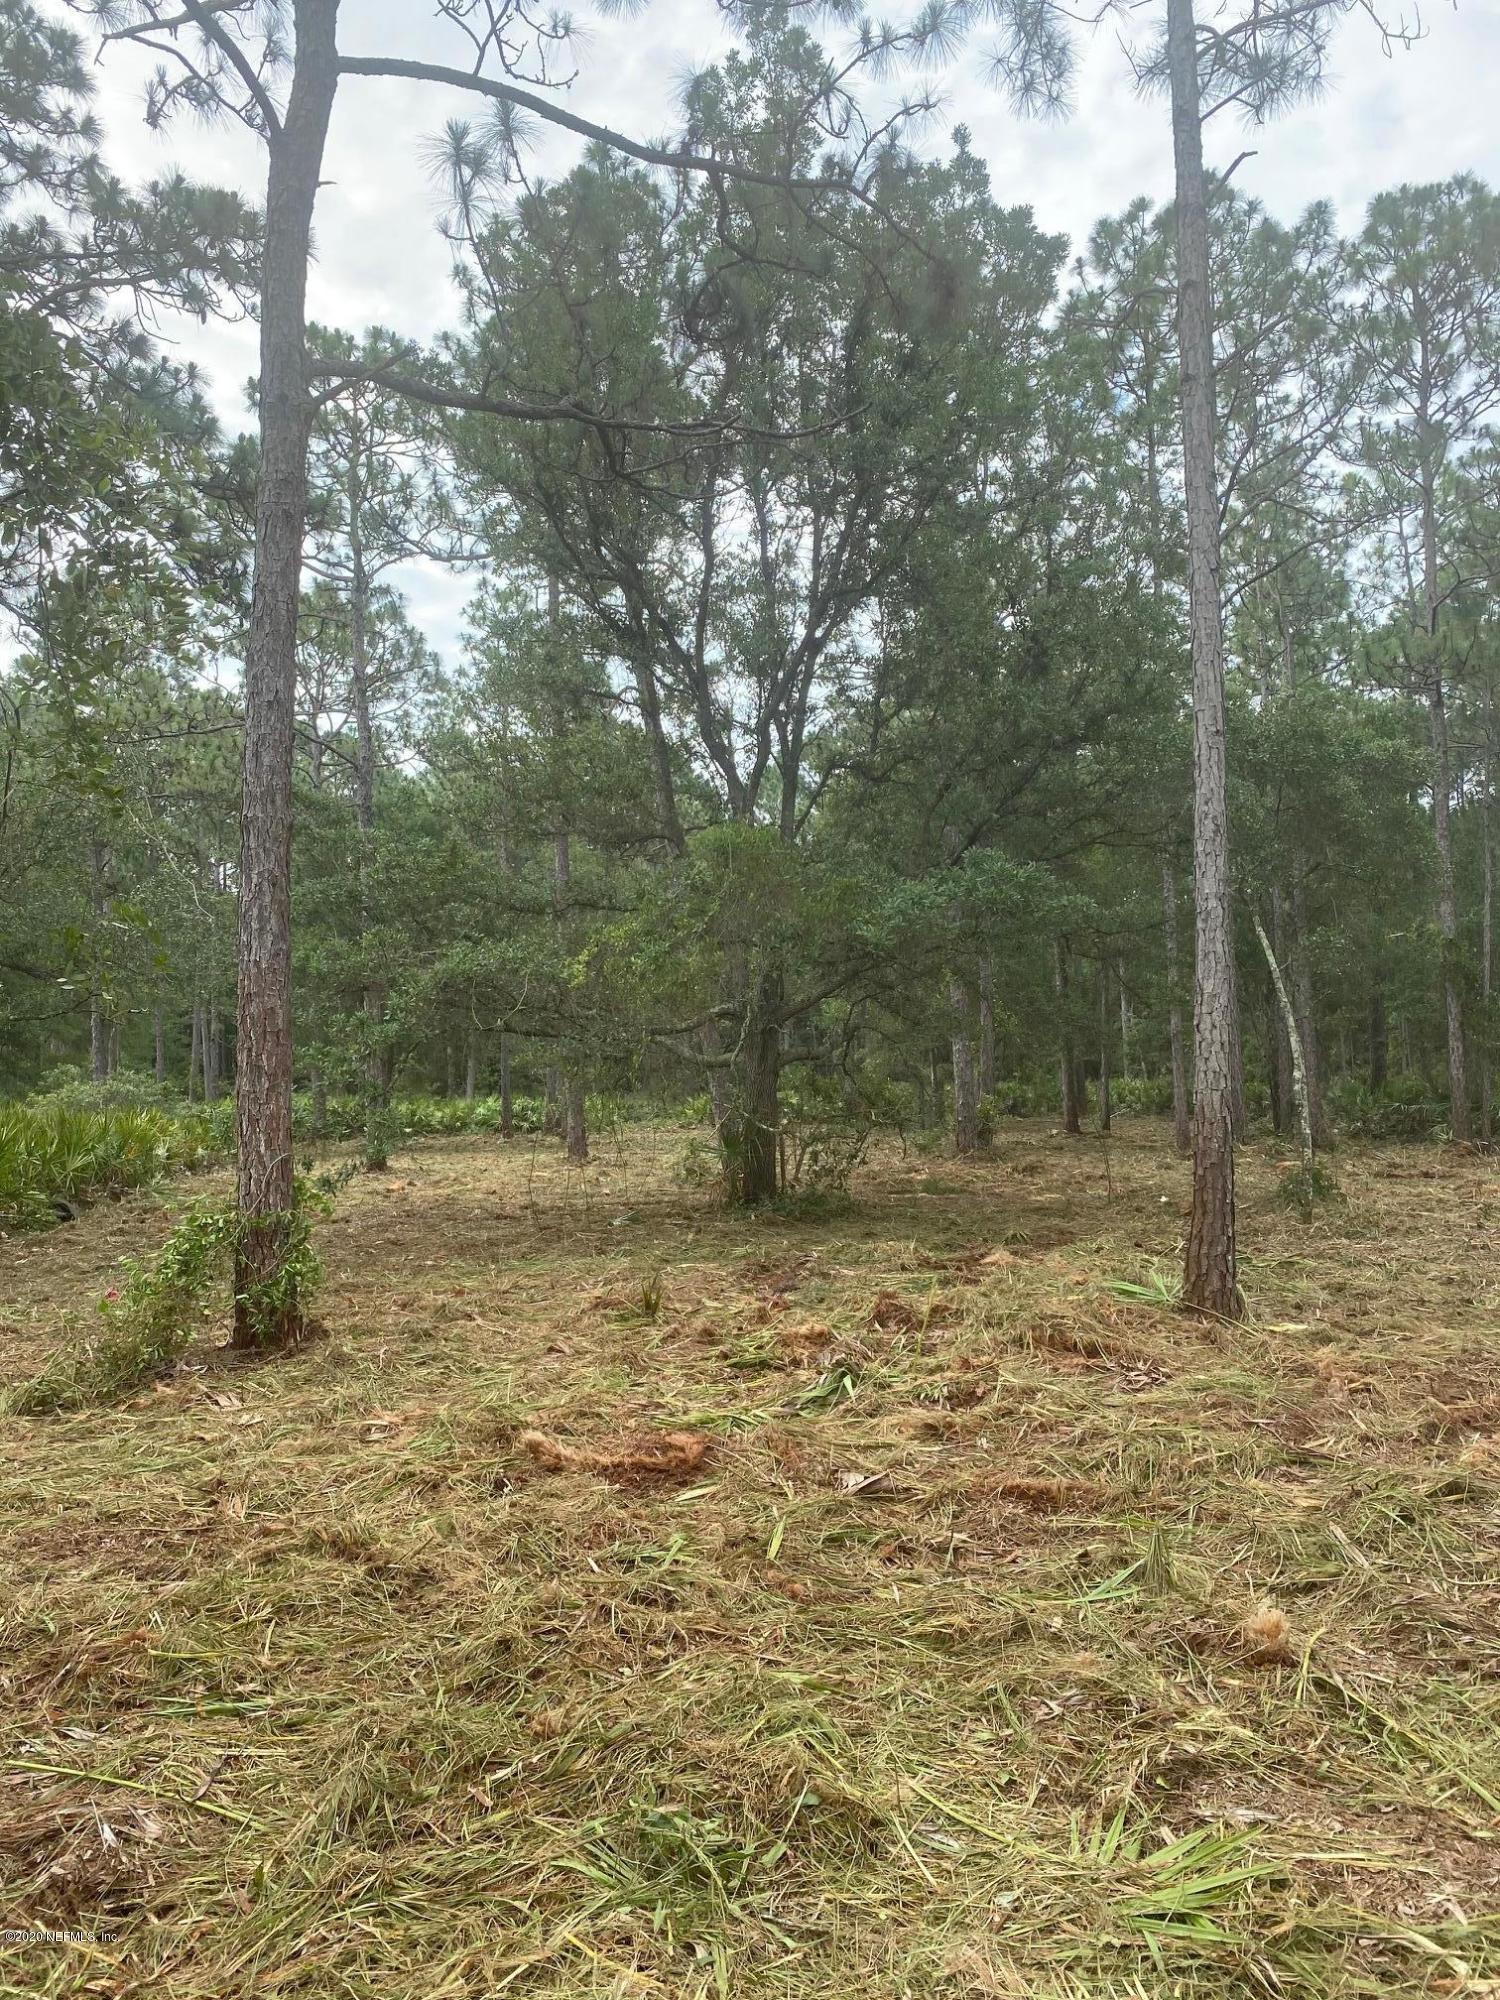 0 PATRICIA, FERNANDINA BEACH, FLORIDA 32034, ,Vacant land,For sale,PATRICIA,1032829